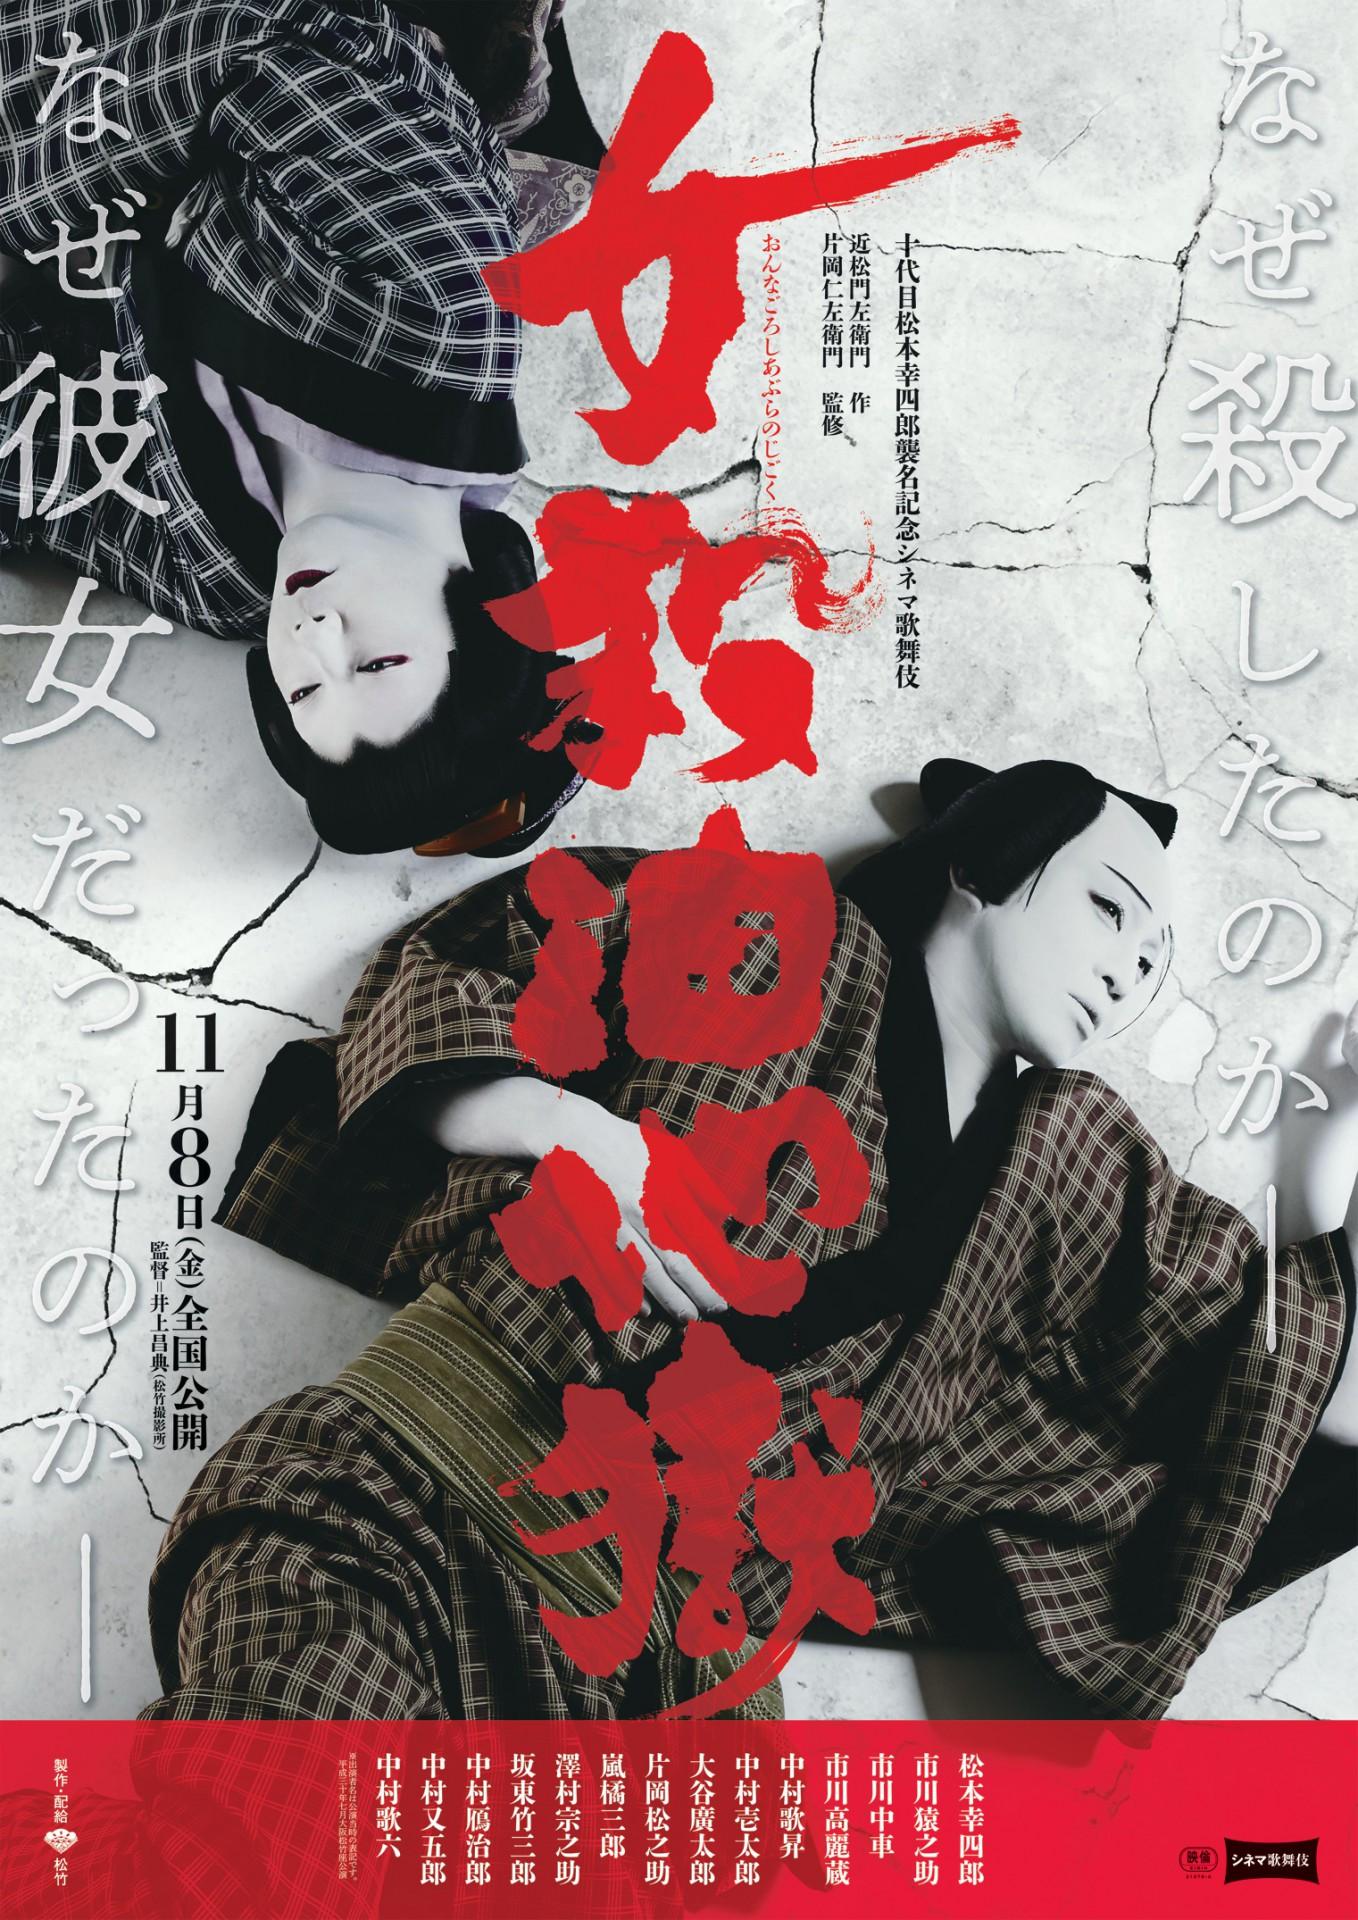 シネマ歌舞伎「女殺油地獄(幸四郎)」